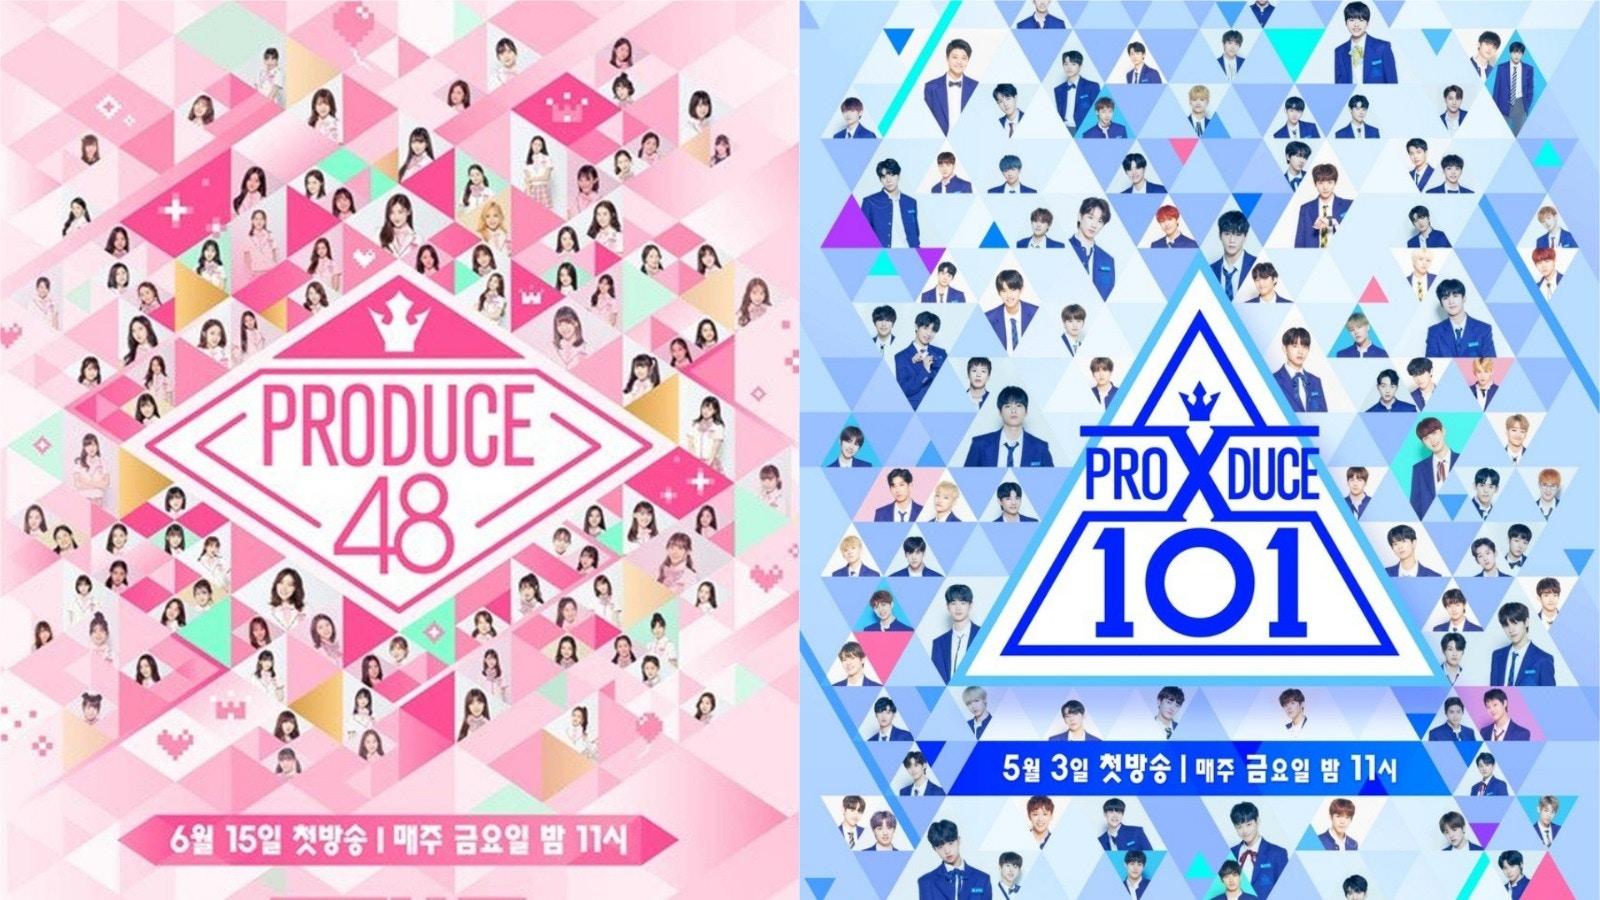 《Produce 101》系列造假超过10人被立案调查,练习生也将被调查,IZONE出演节目被全剪插图2